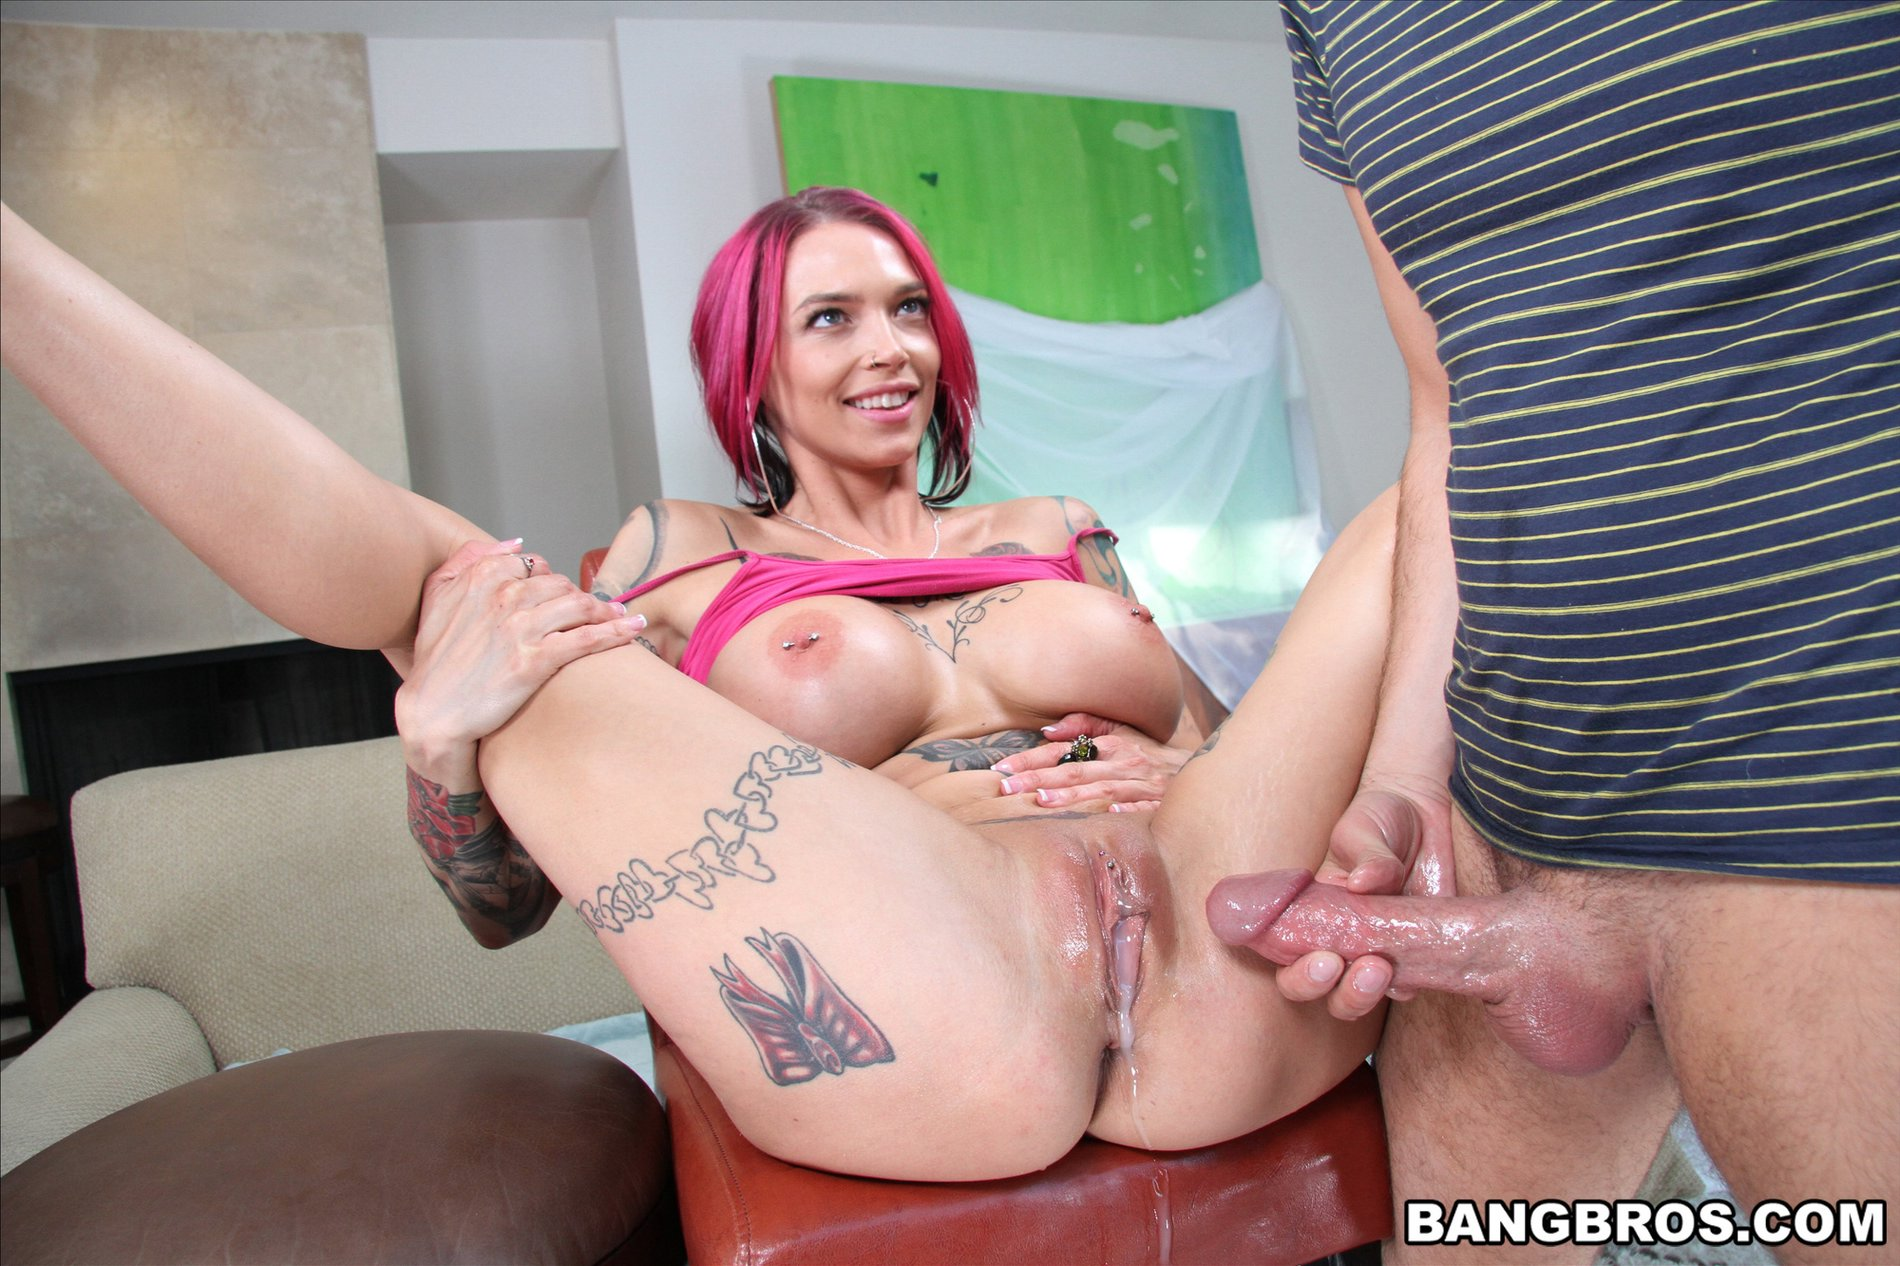 anna from bangbros pornstar